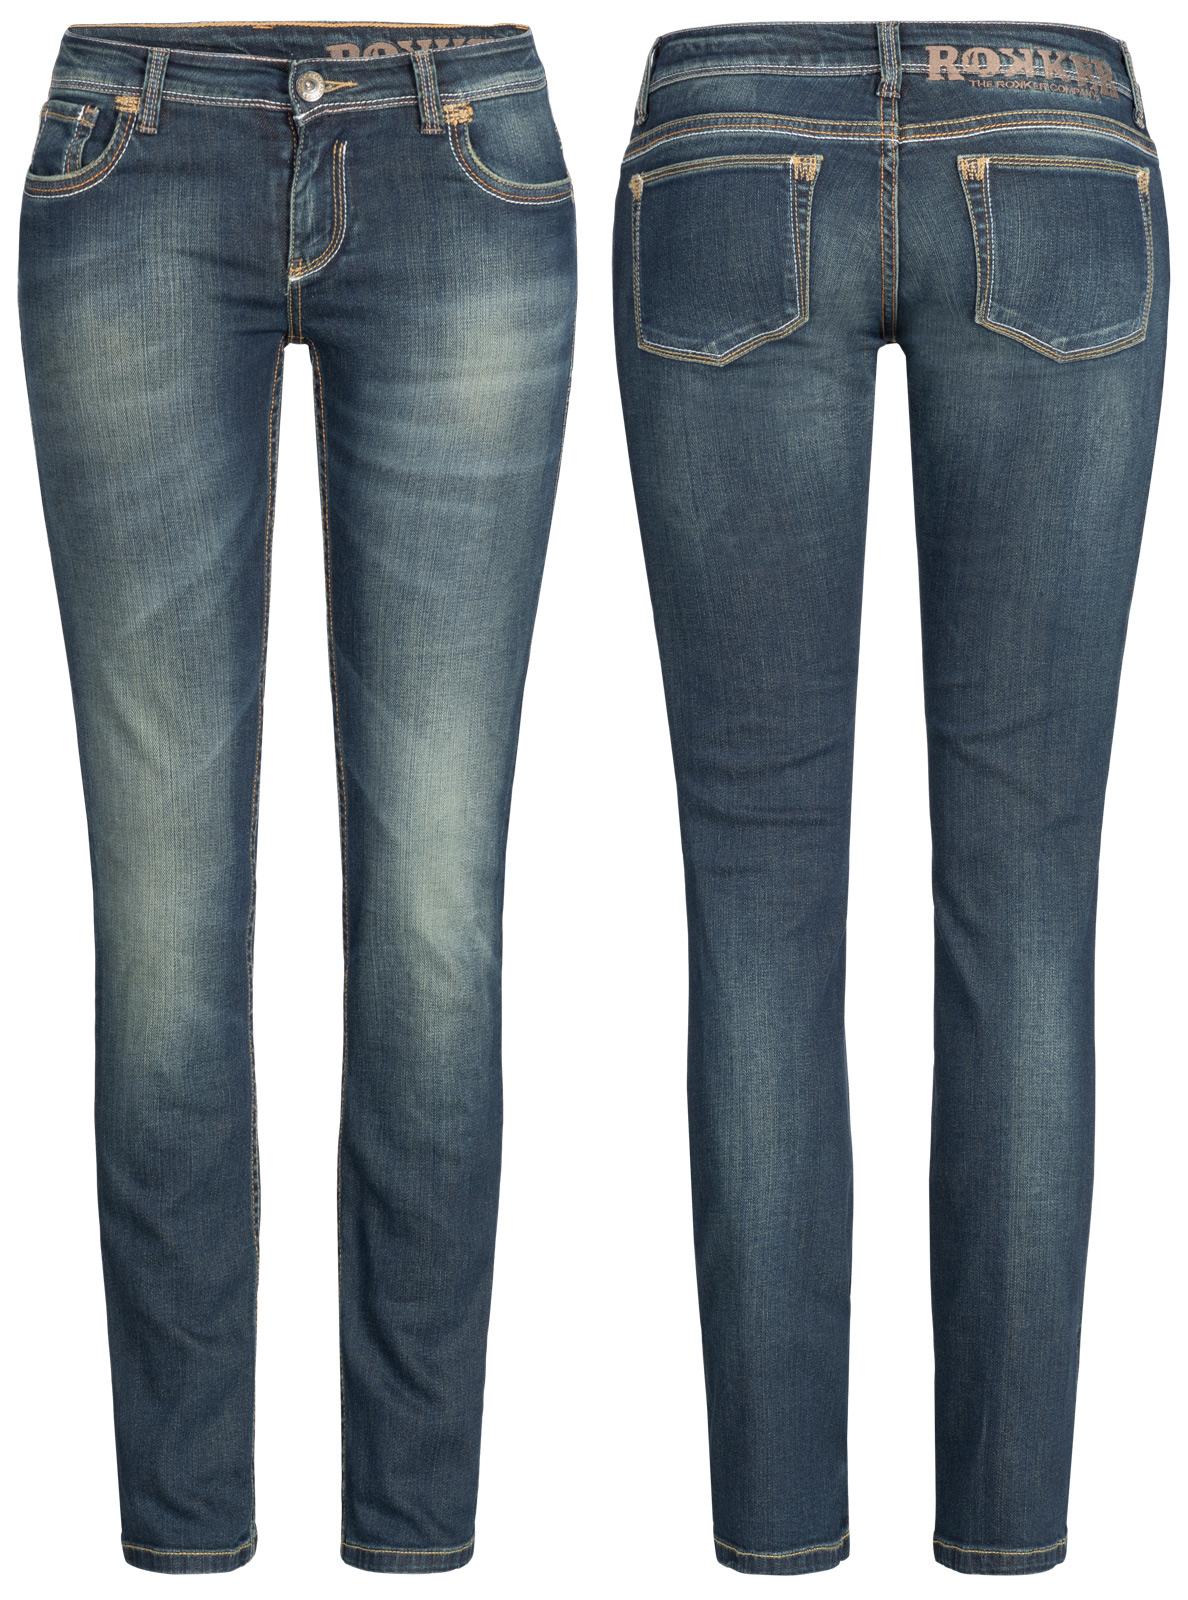 906a8bc7076e Rokker Jeans The Diva Kevlar Damen Motorradhose